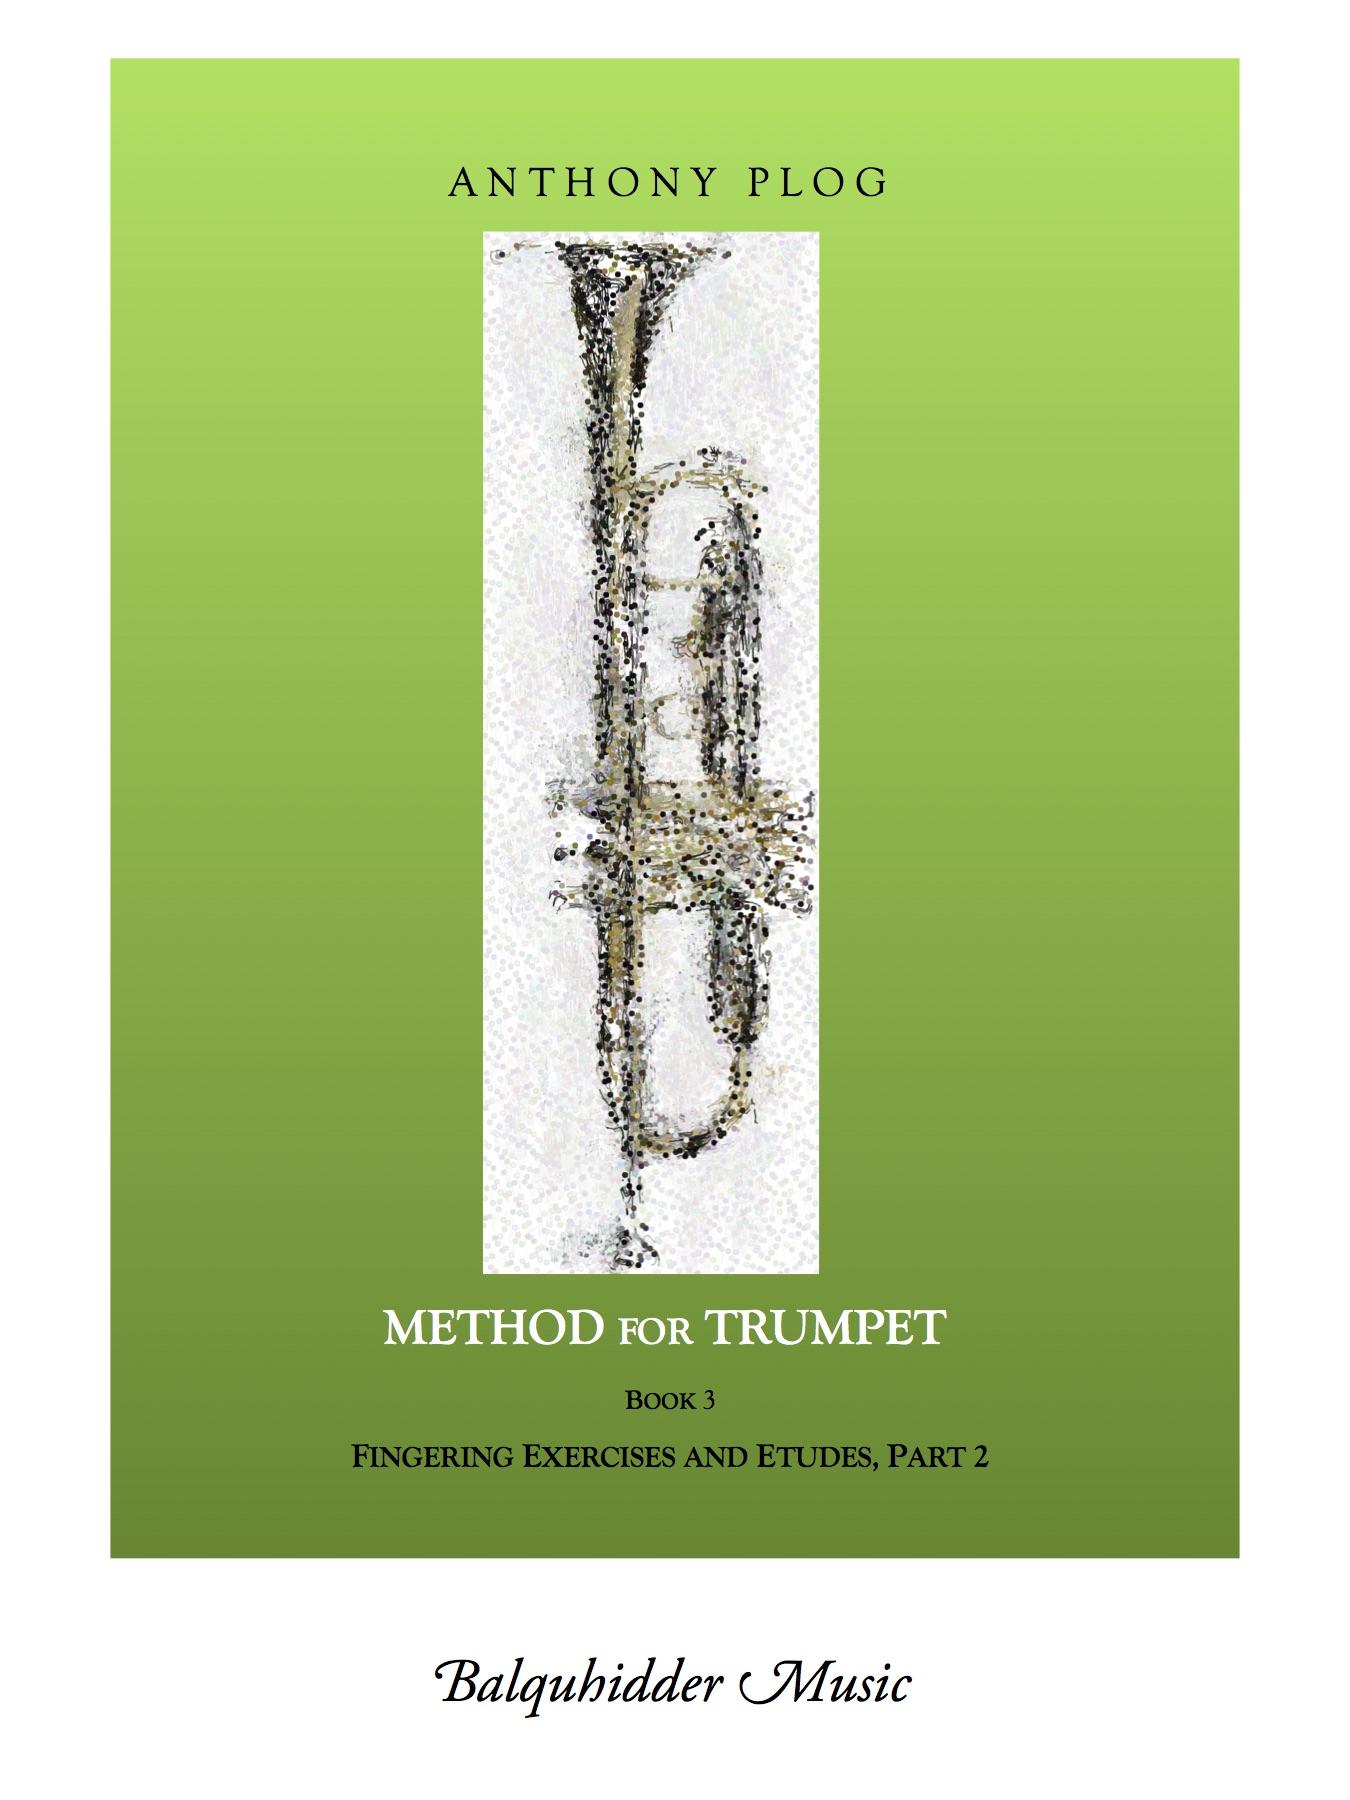 Method for Trumpet, Book 3 (Plog) — Balquhidder Music